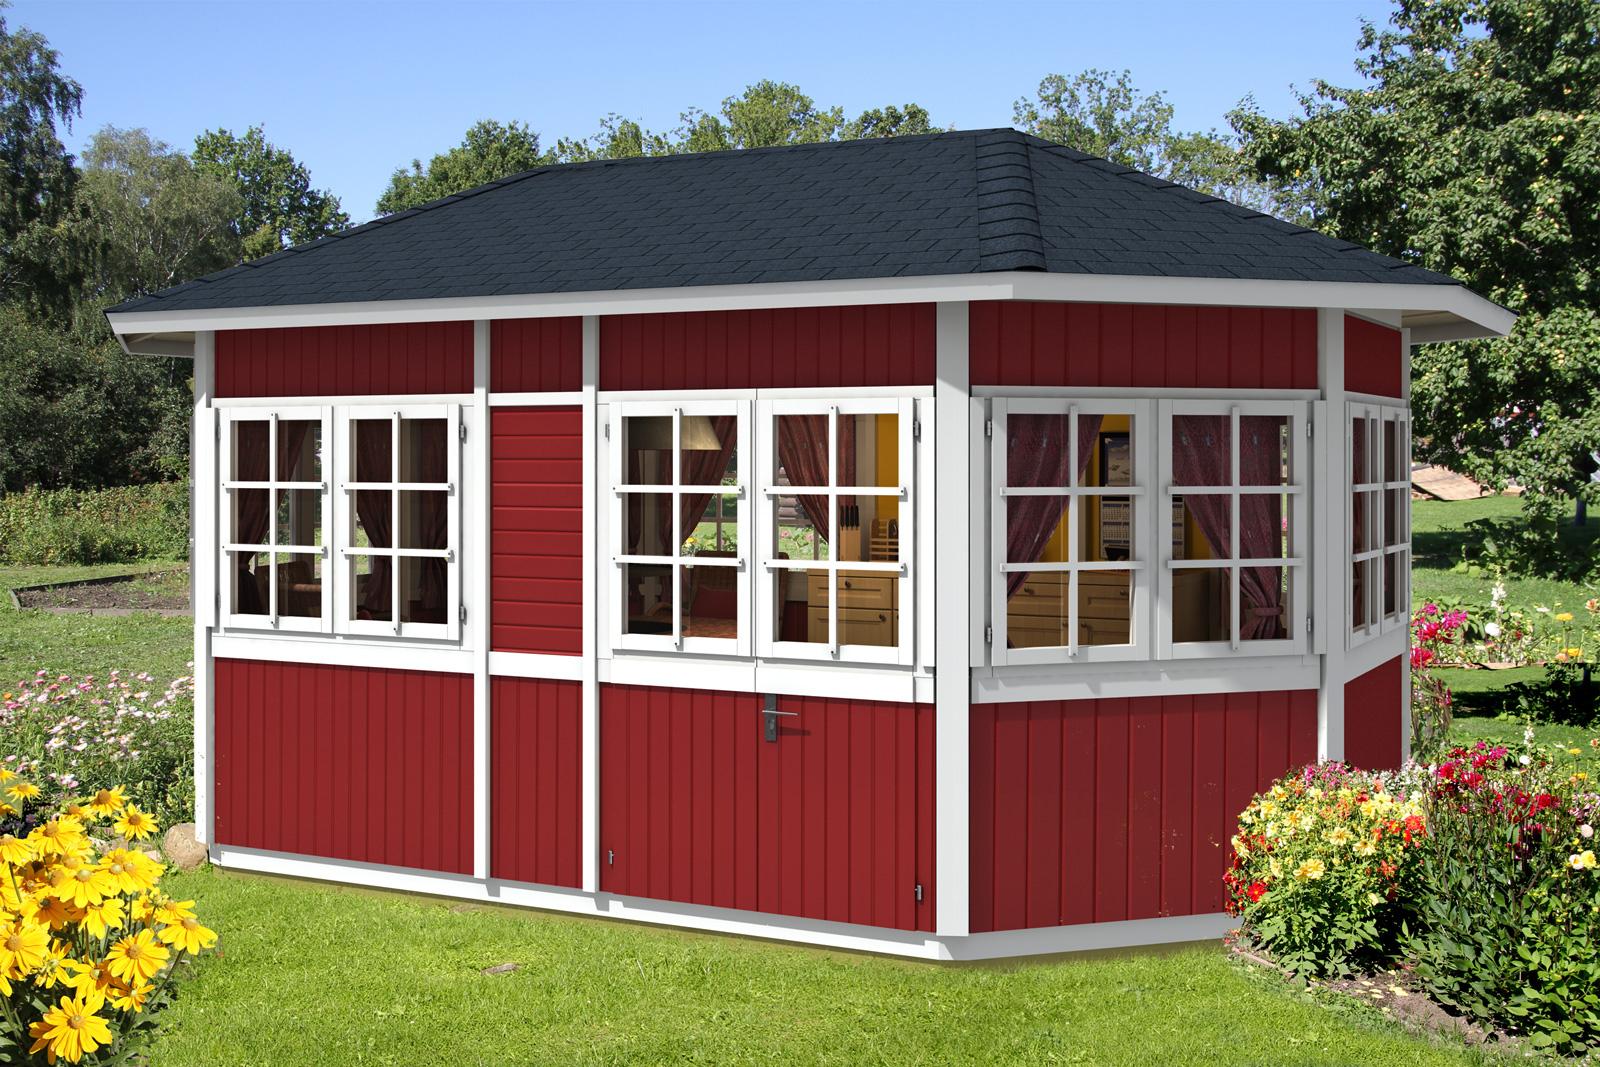 gartenpavillon aufbauanleitung 00 40 09. Black Bedroom Furniture Sets. Home Design Ideas